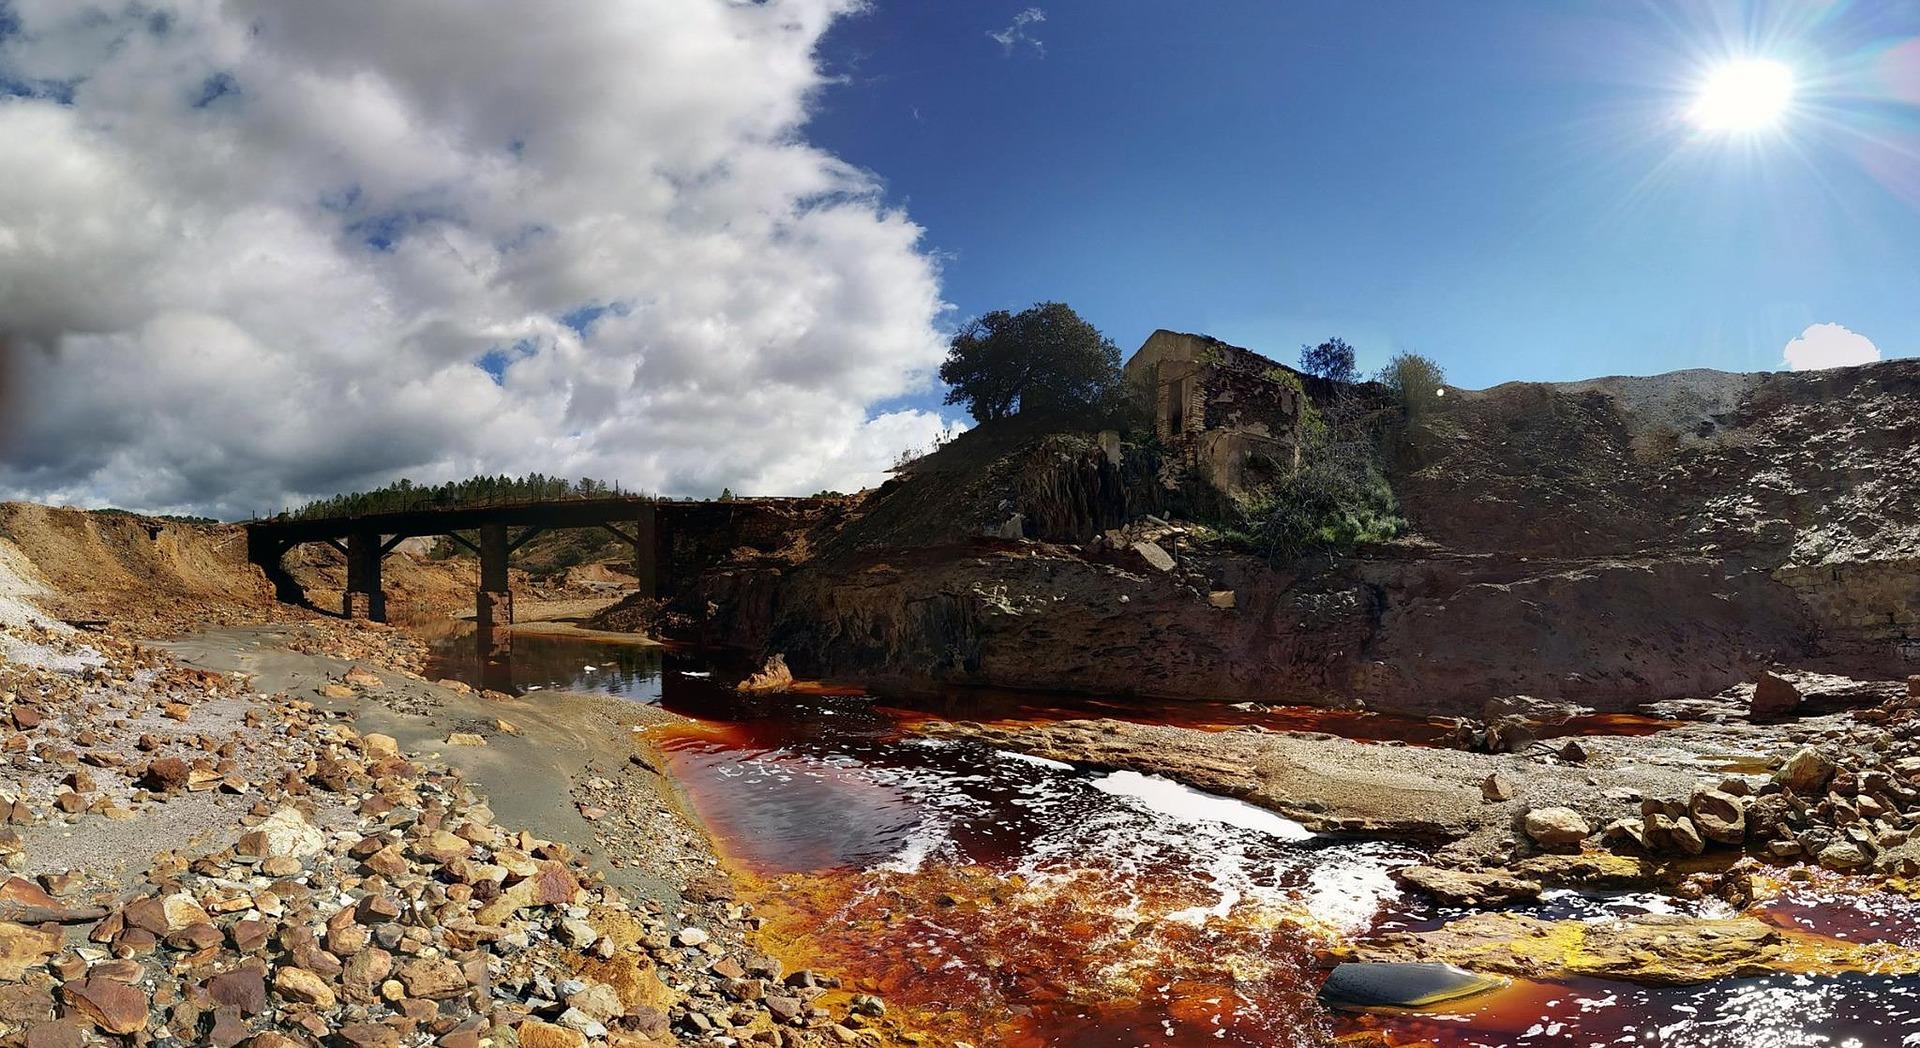 Nerva, Rio Tinto, Huelva